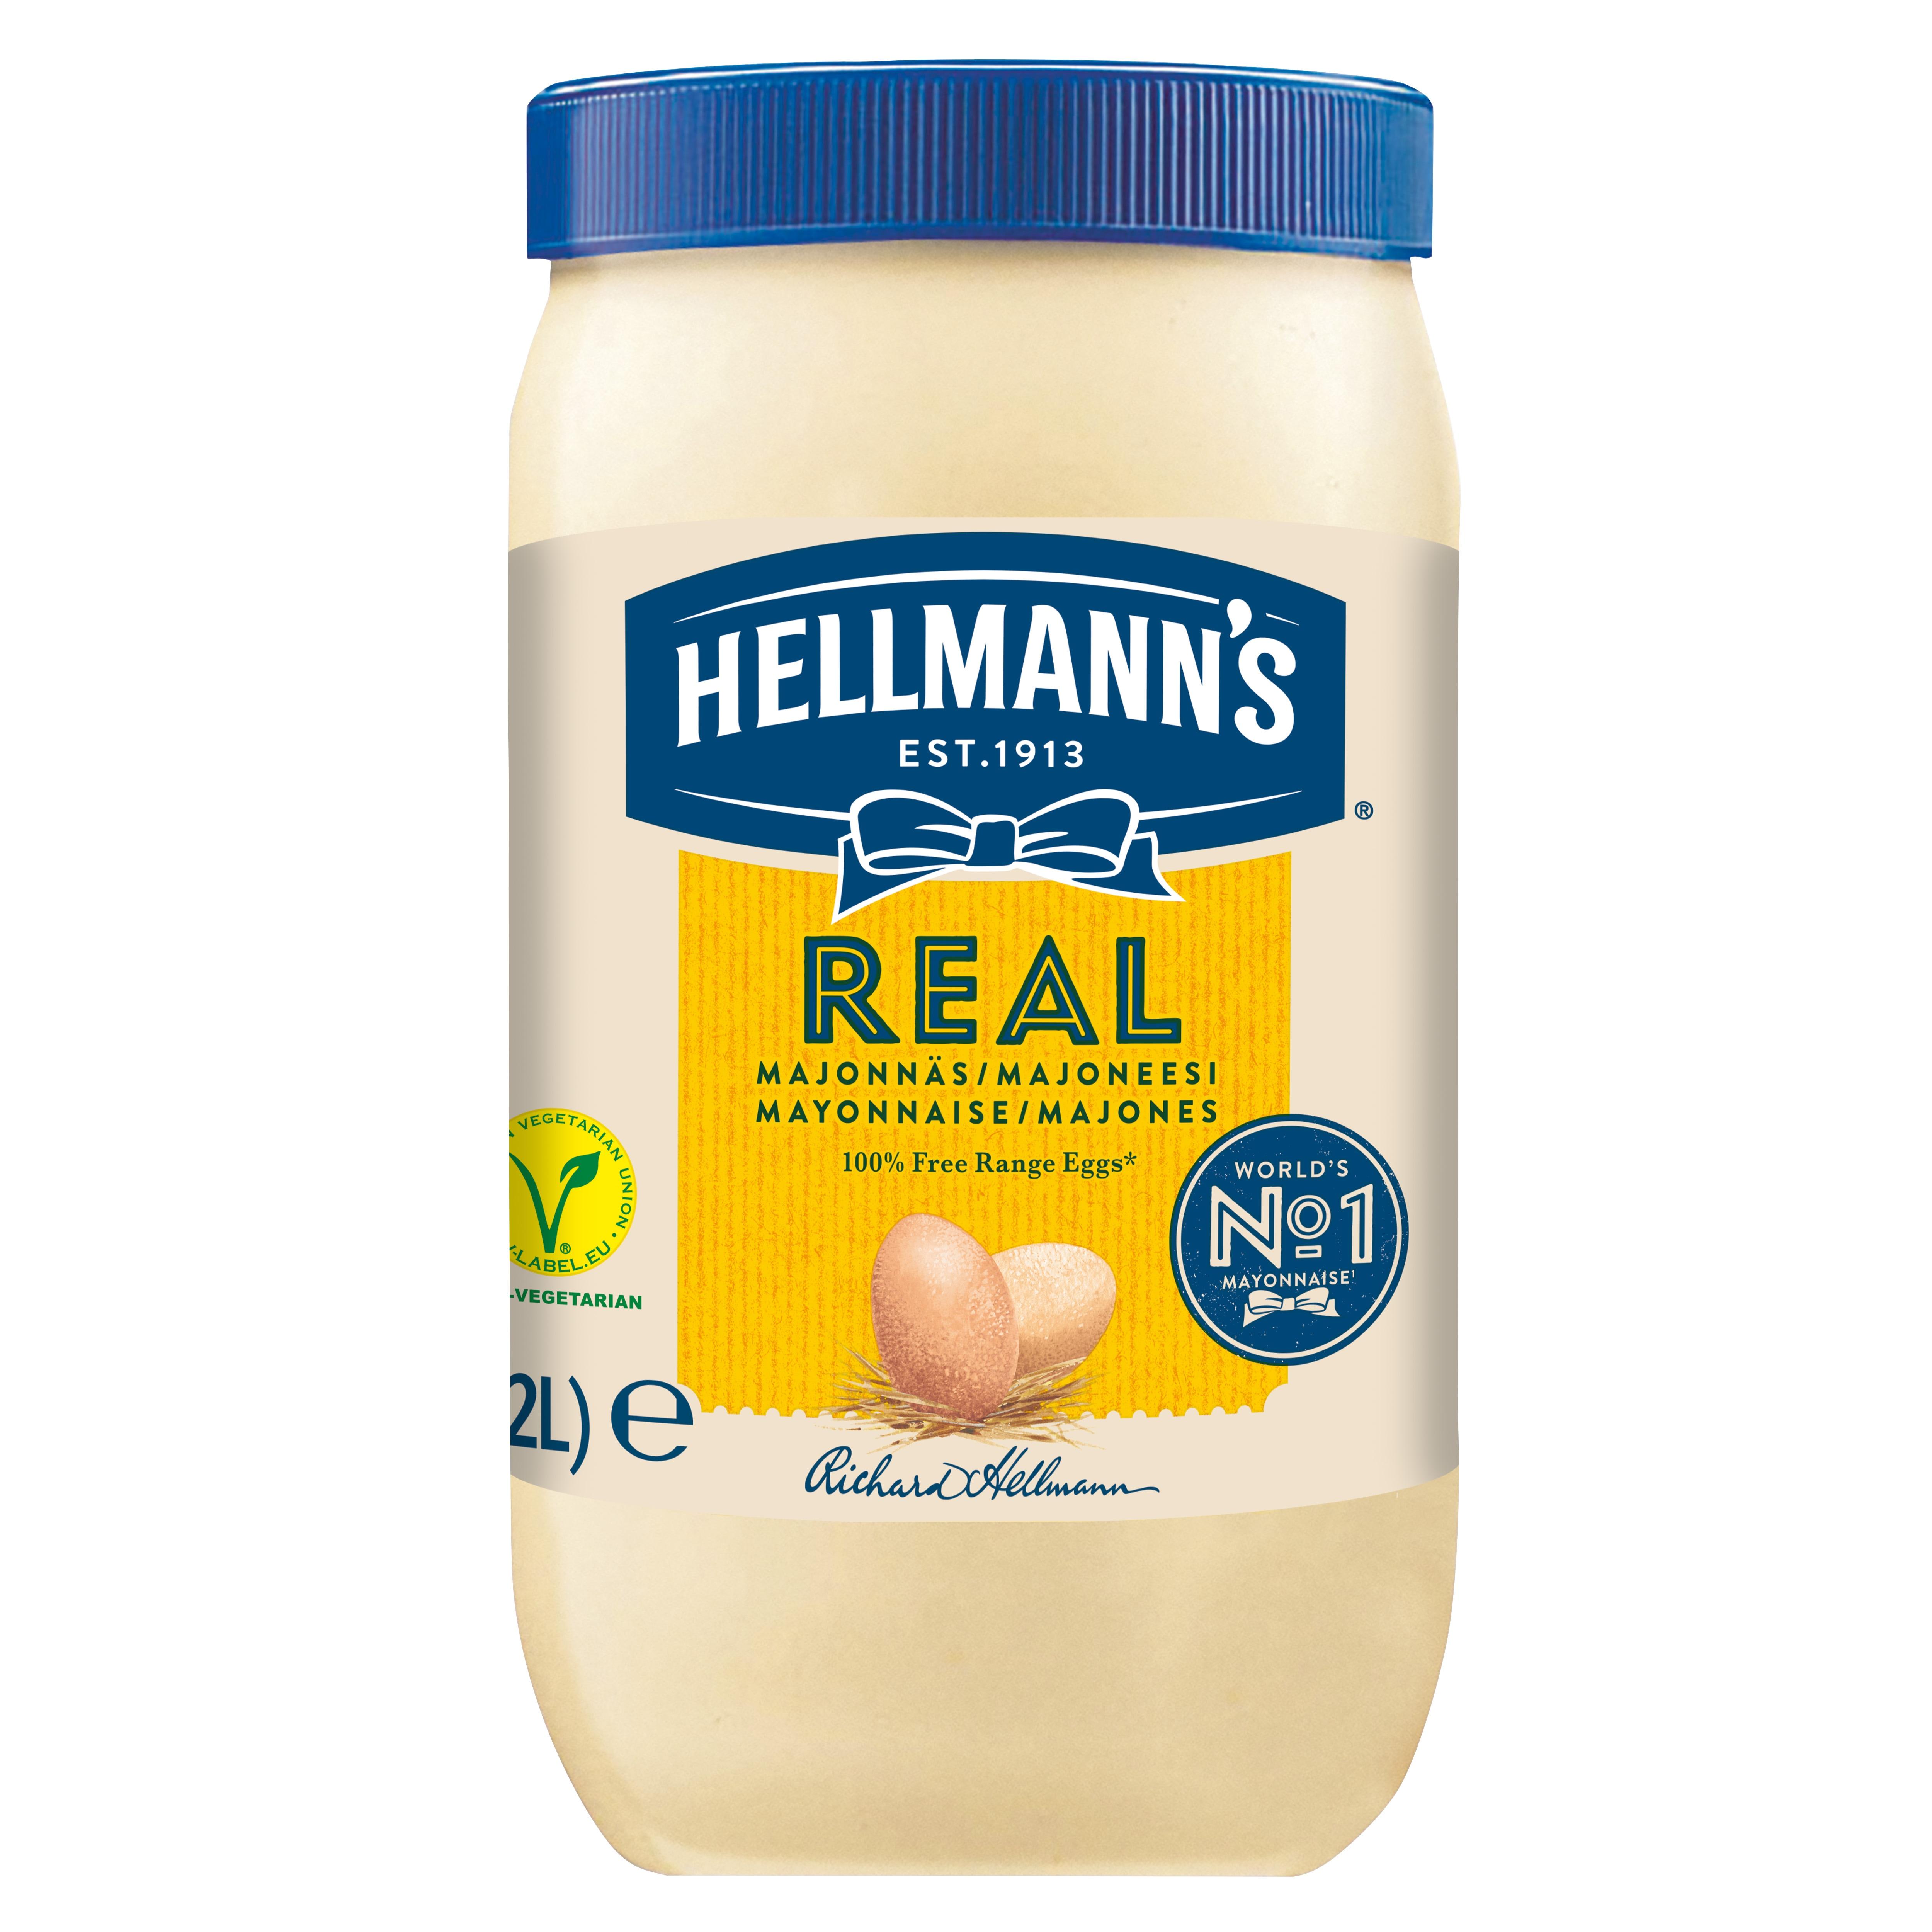 Hellmann's Real Mayonnaise 2 l. / 1,85 kg -